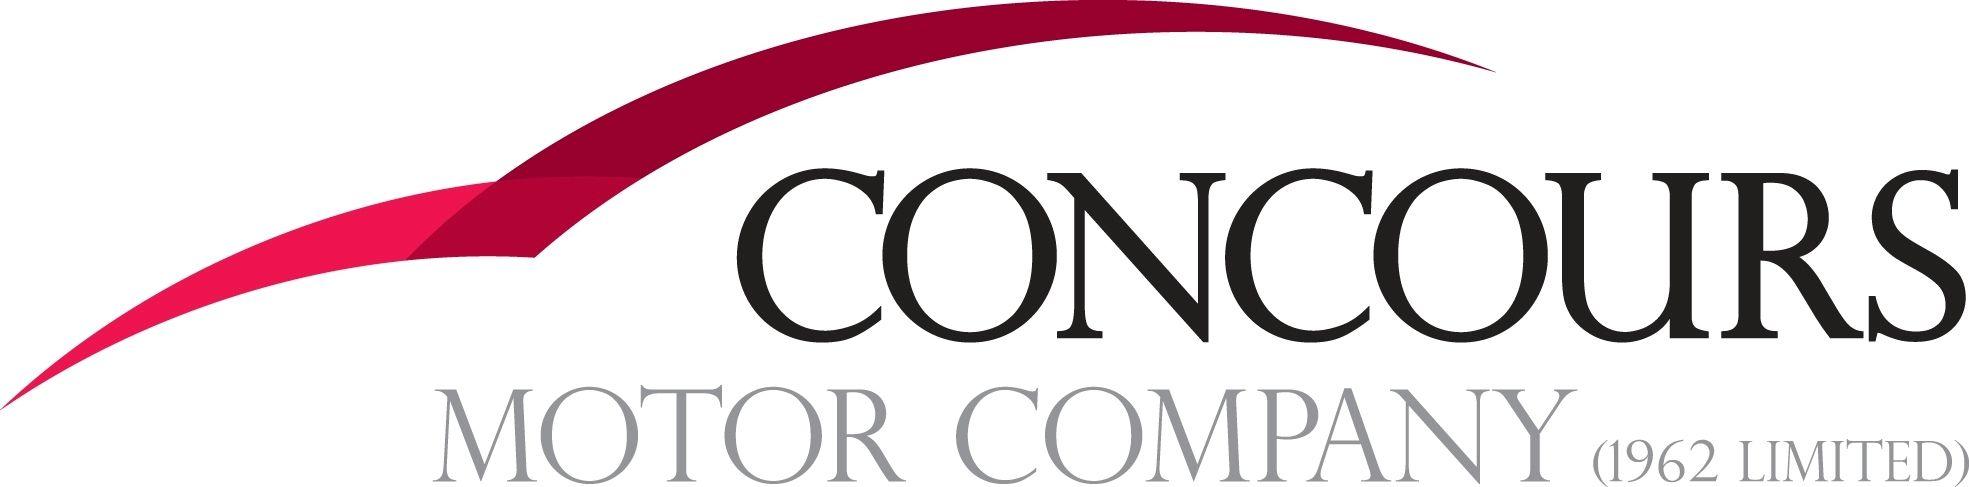 Concours Motor Company ltd